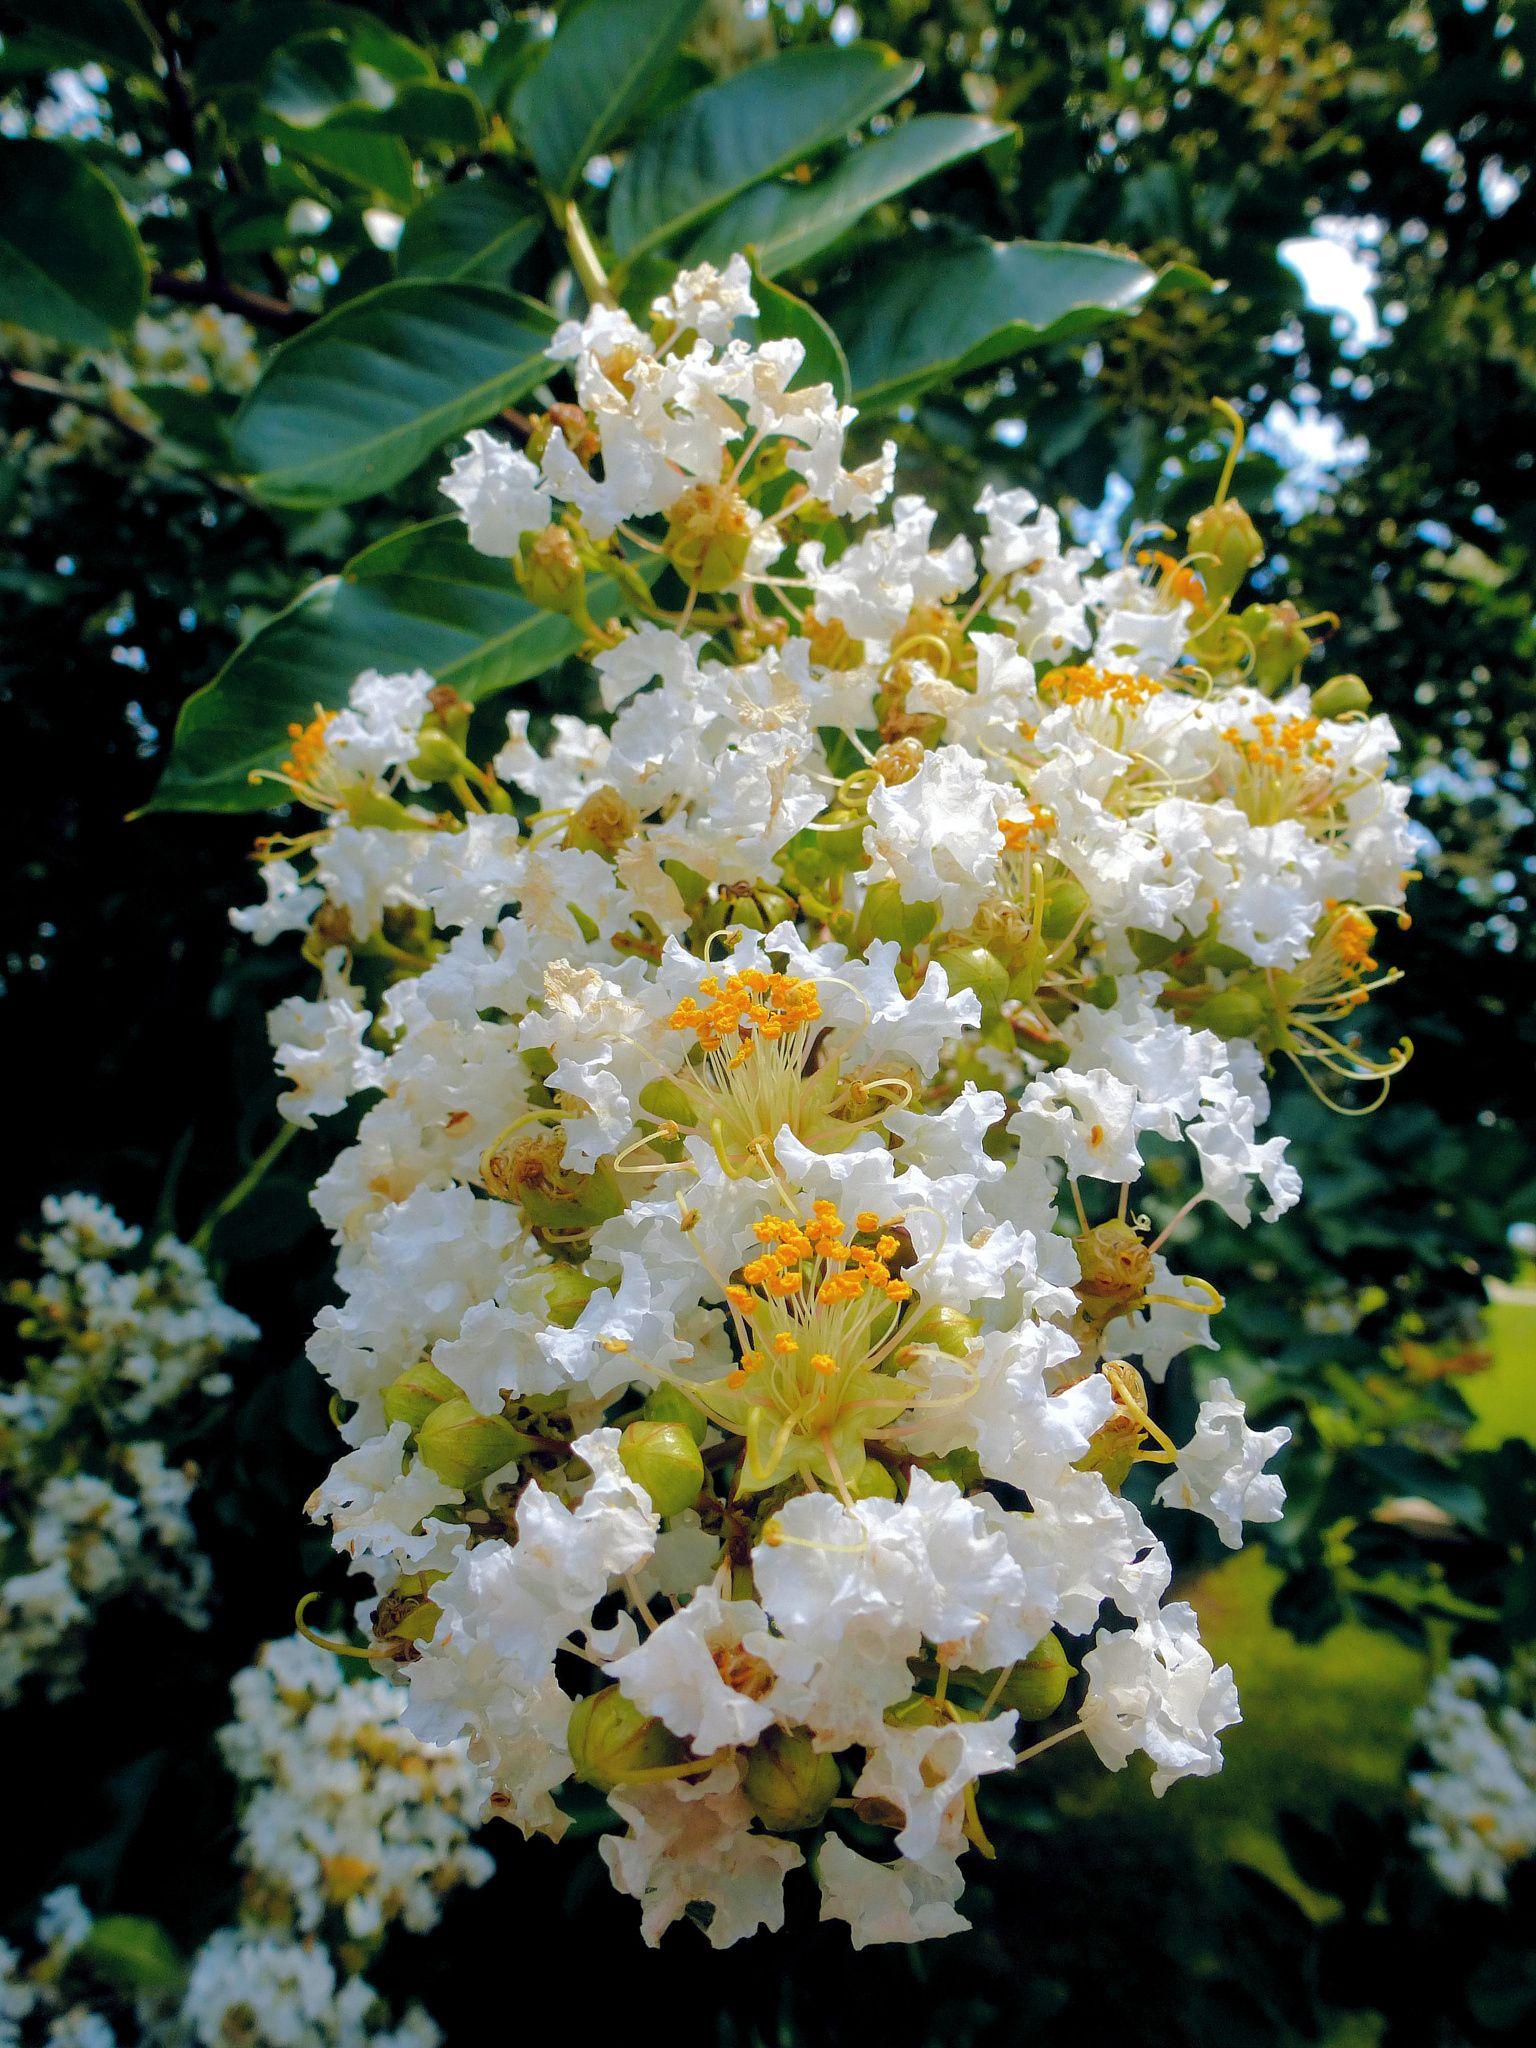 Crepe Myrtle White White Crepe Myrtle Blossoms Flowers